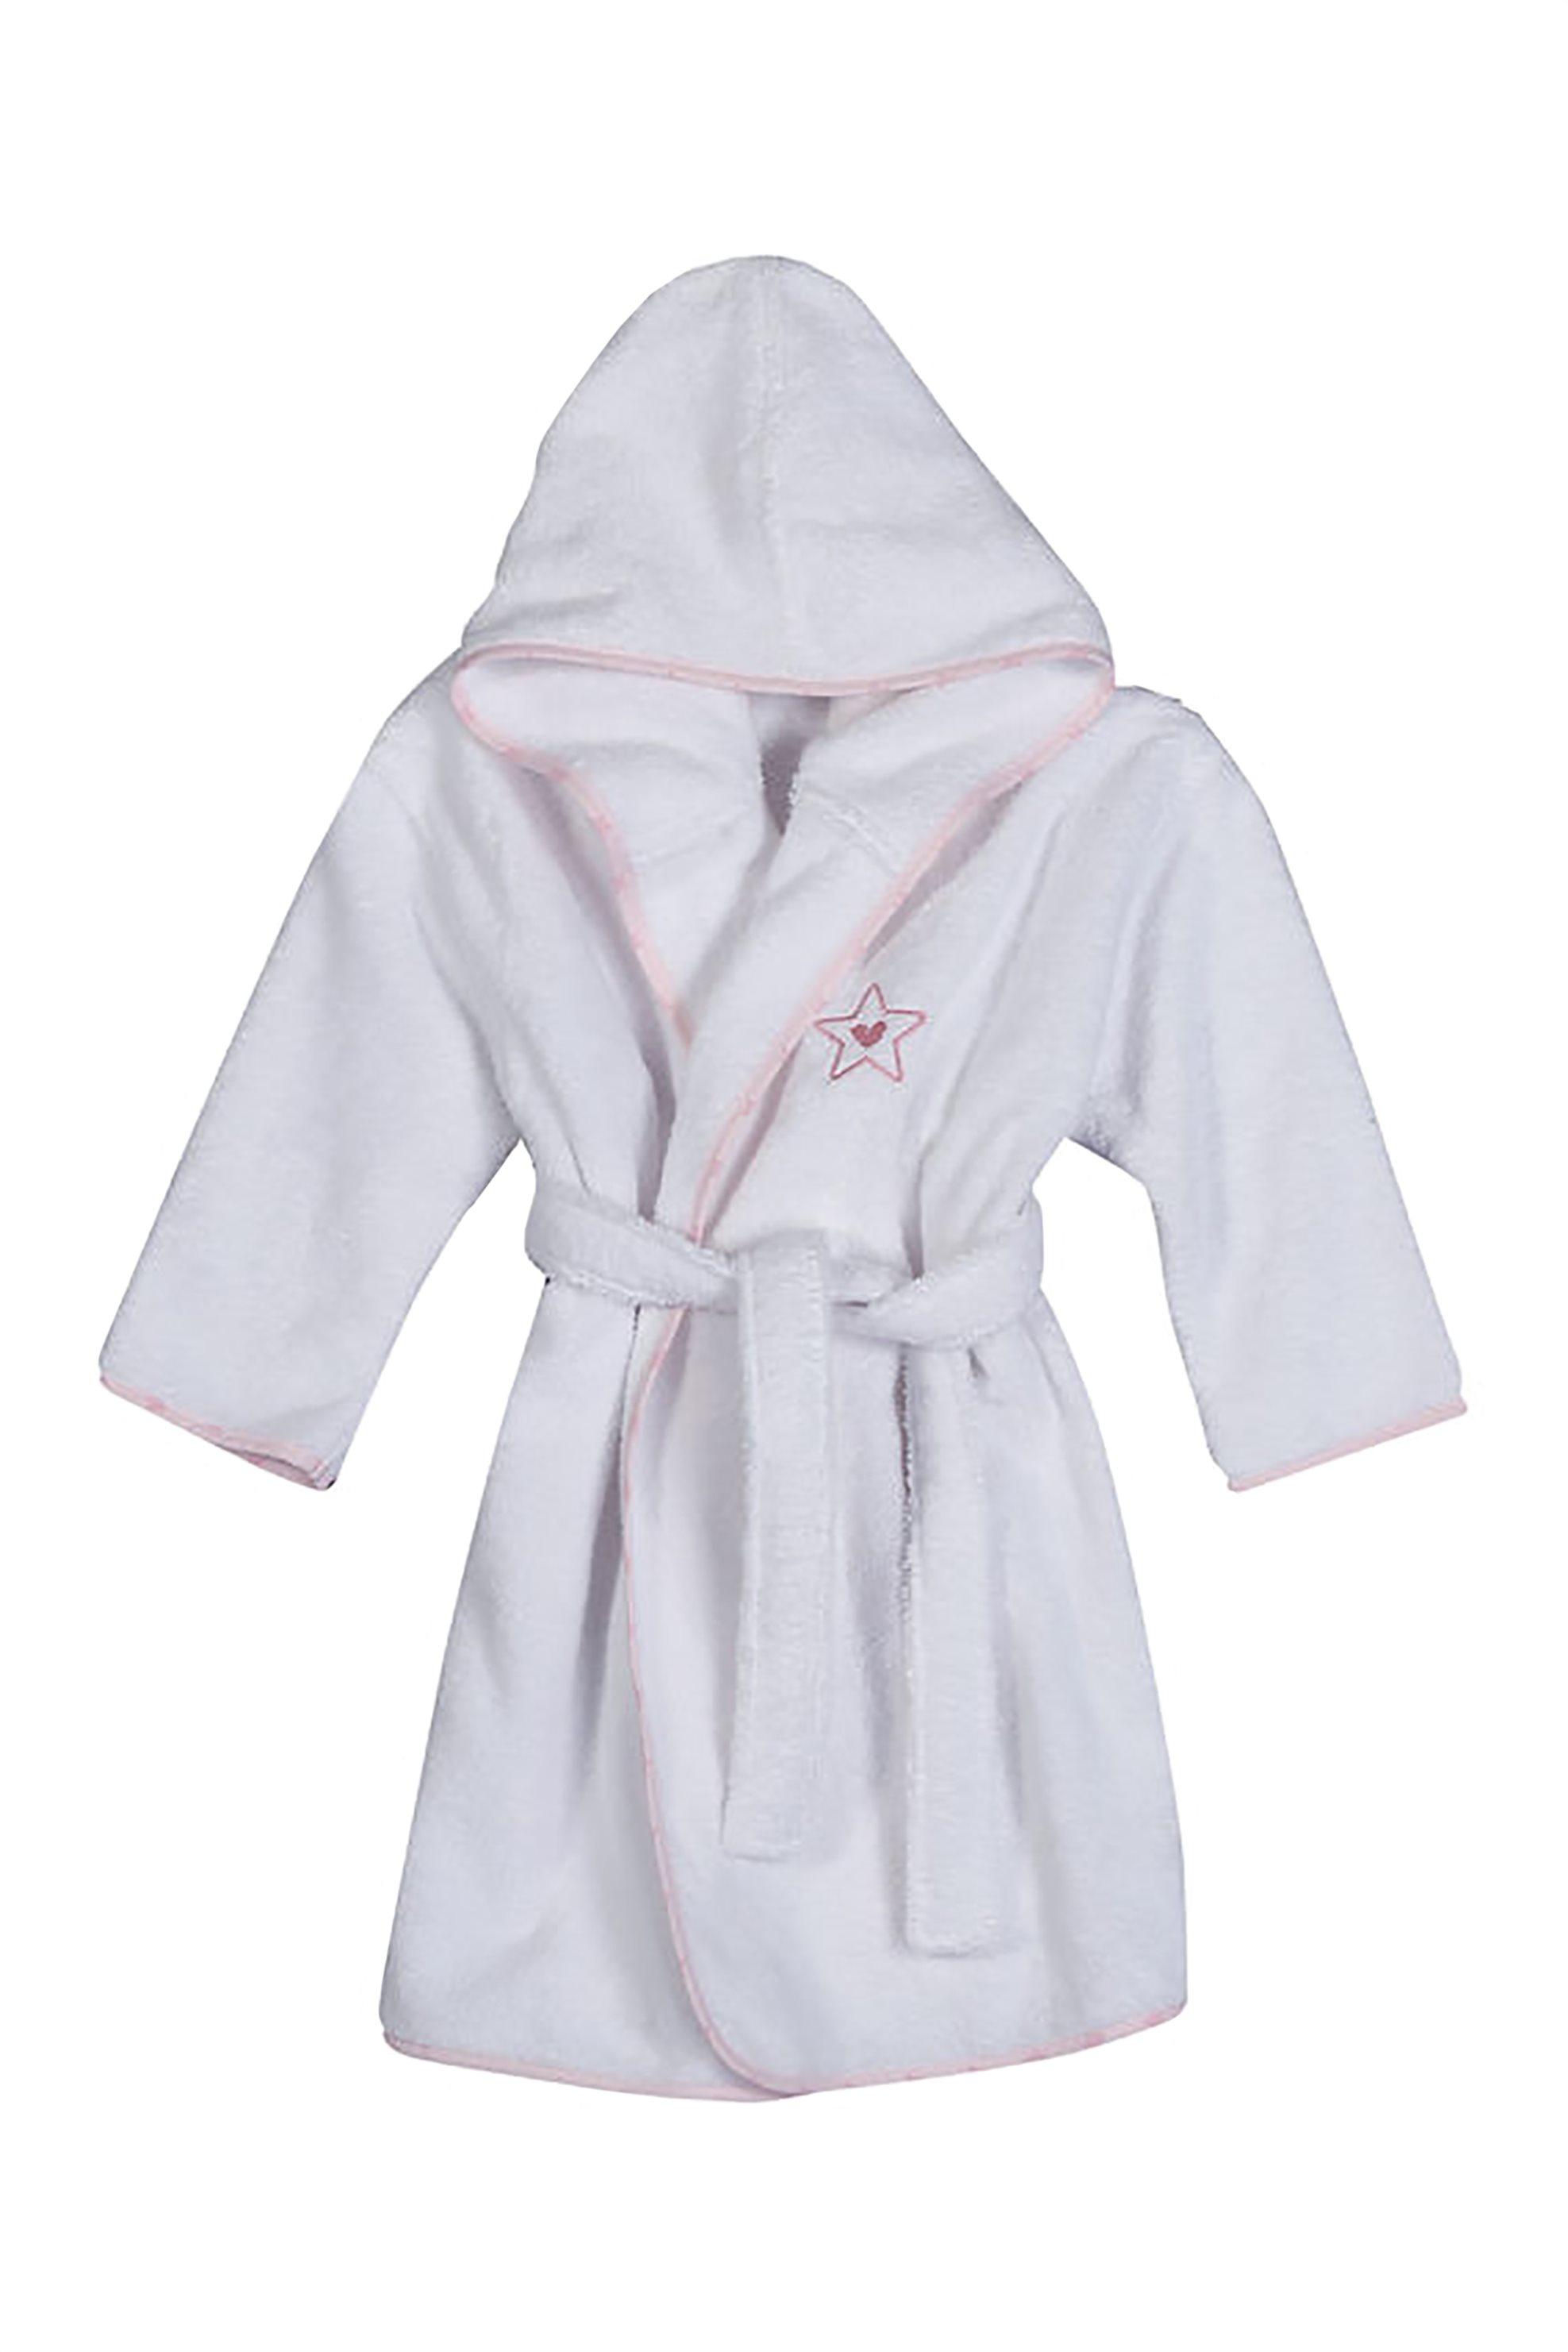 NEF-NEF Βρεφικό μπουρνούζι Dream& Wishes  - 021572 - Λευκό home   παιδια   παιδικά μπουρνούζια   ρόμπες